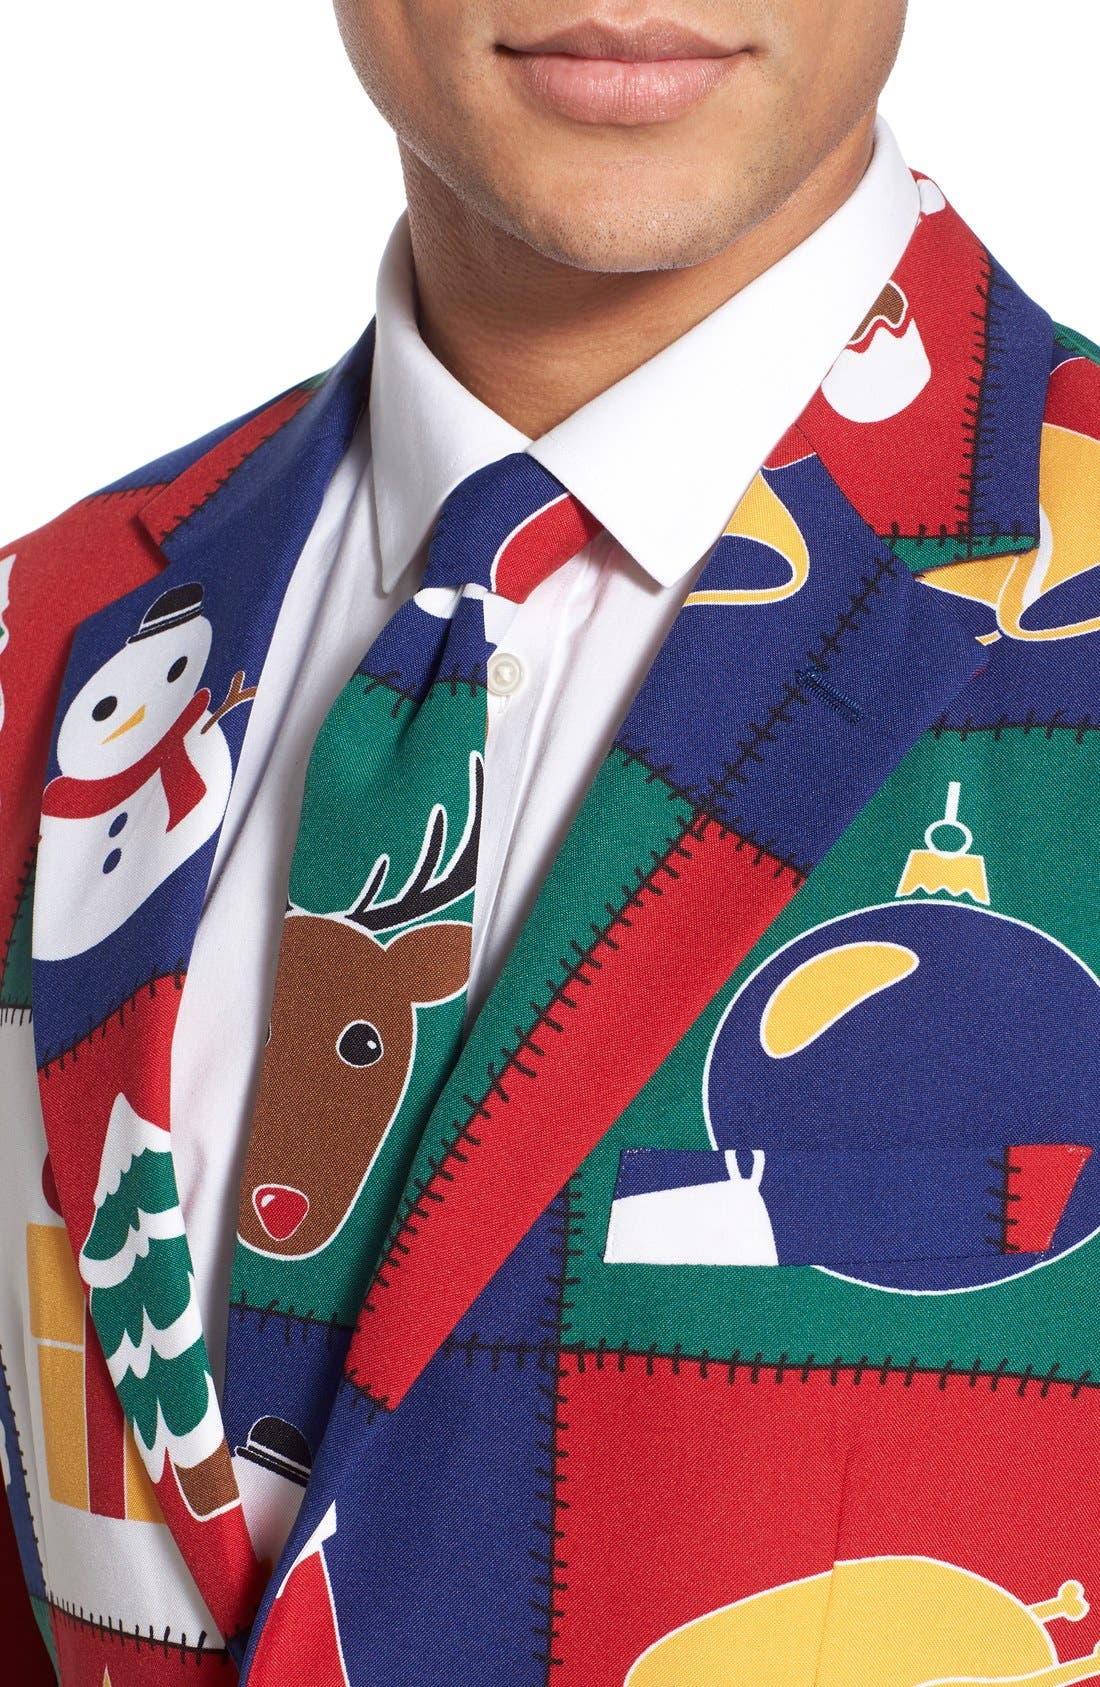 'Quilty Pleasure' Holiday Suit & Tie,                             Alternate thumbnail 3, color,                             300